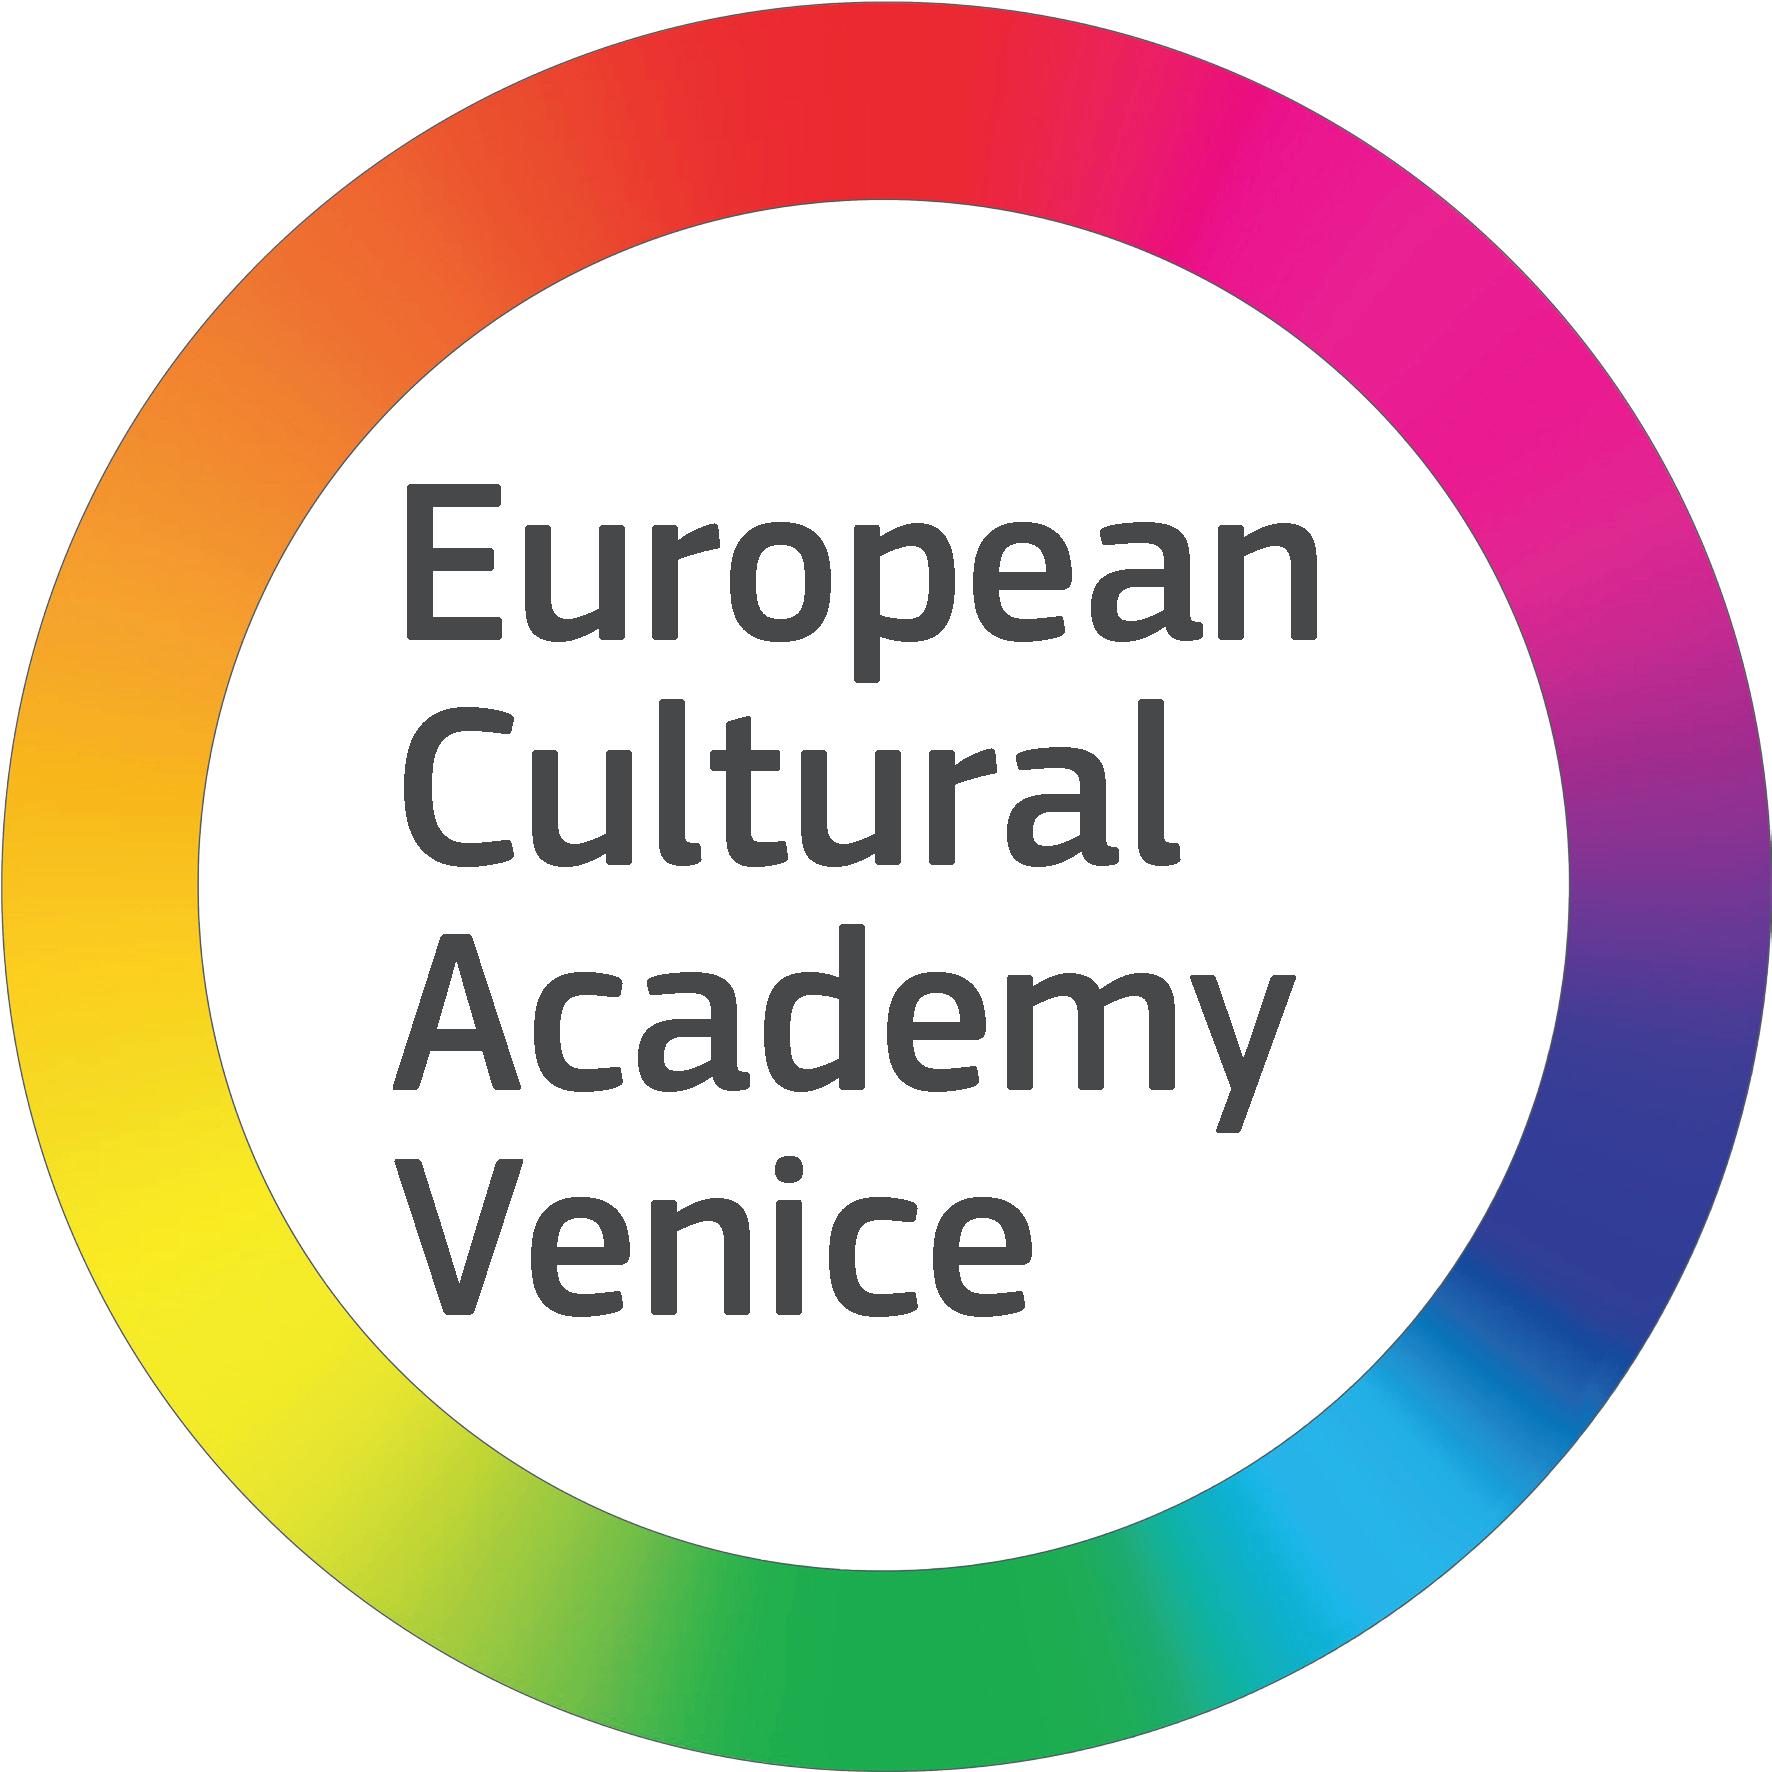 European Cultural Academy